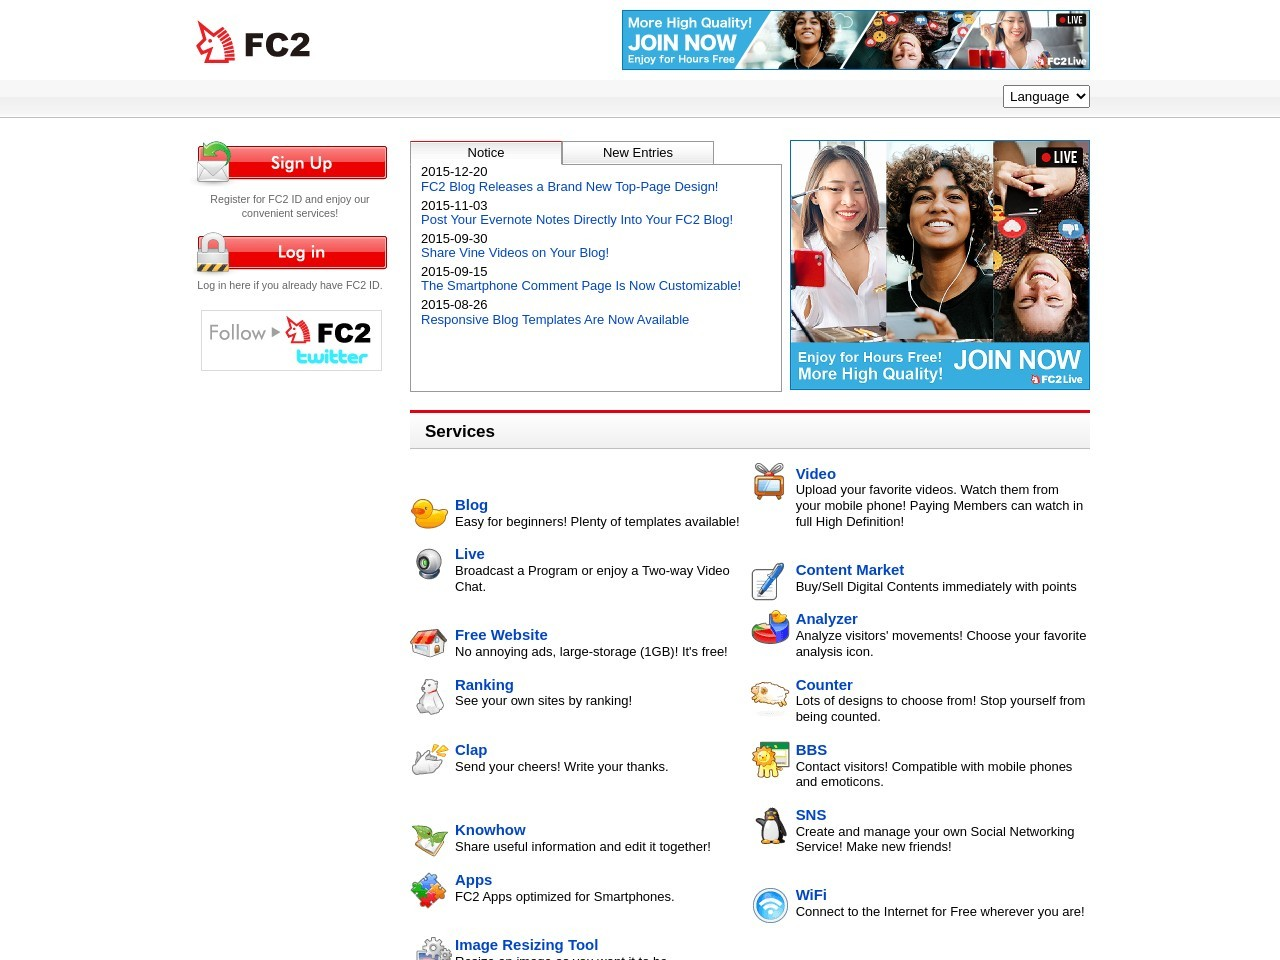 Webthumbnail fc2.com